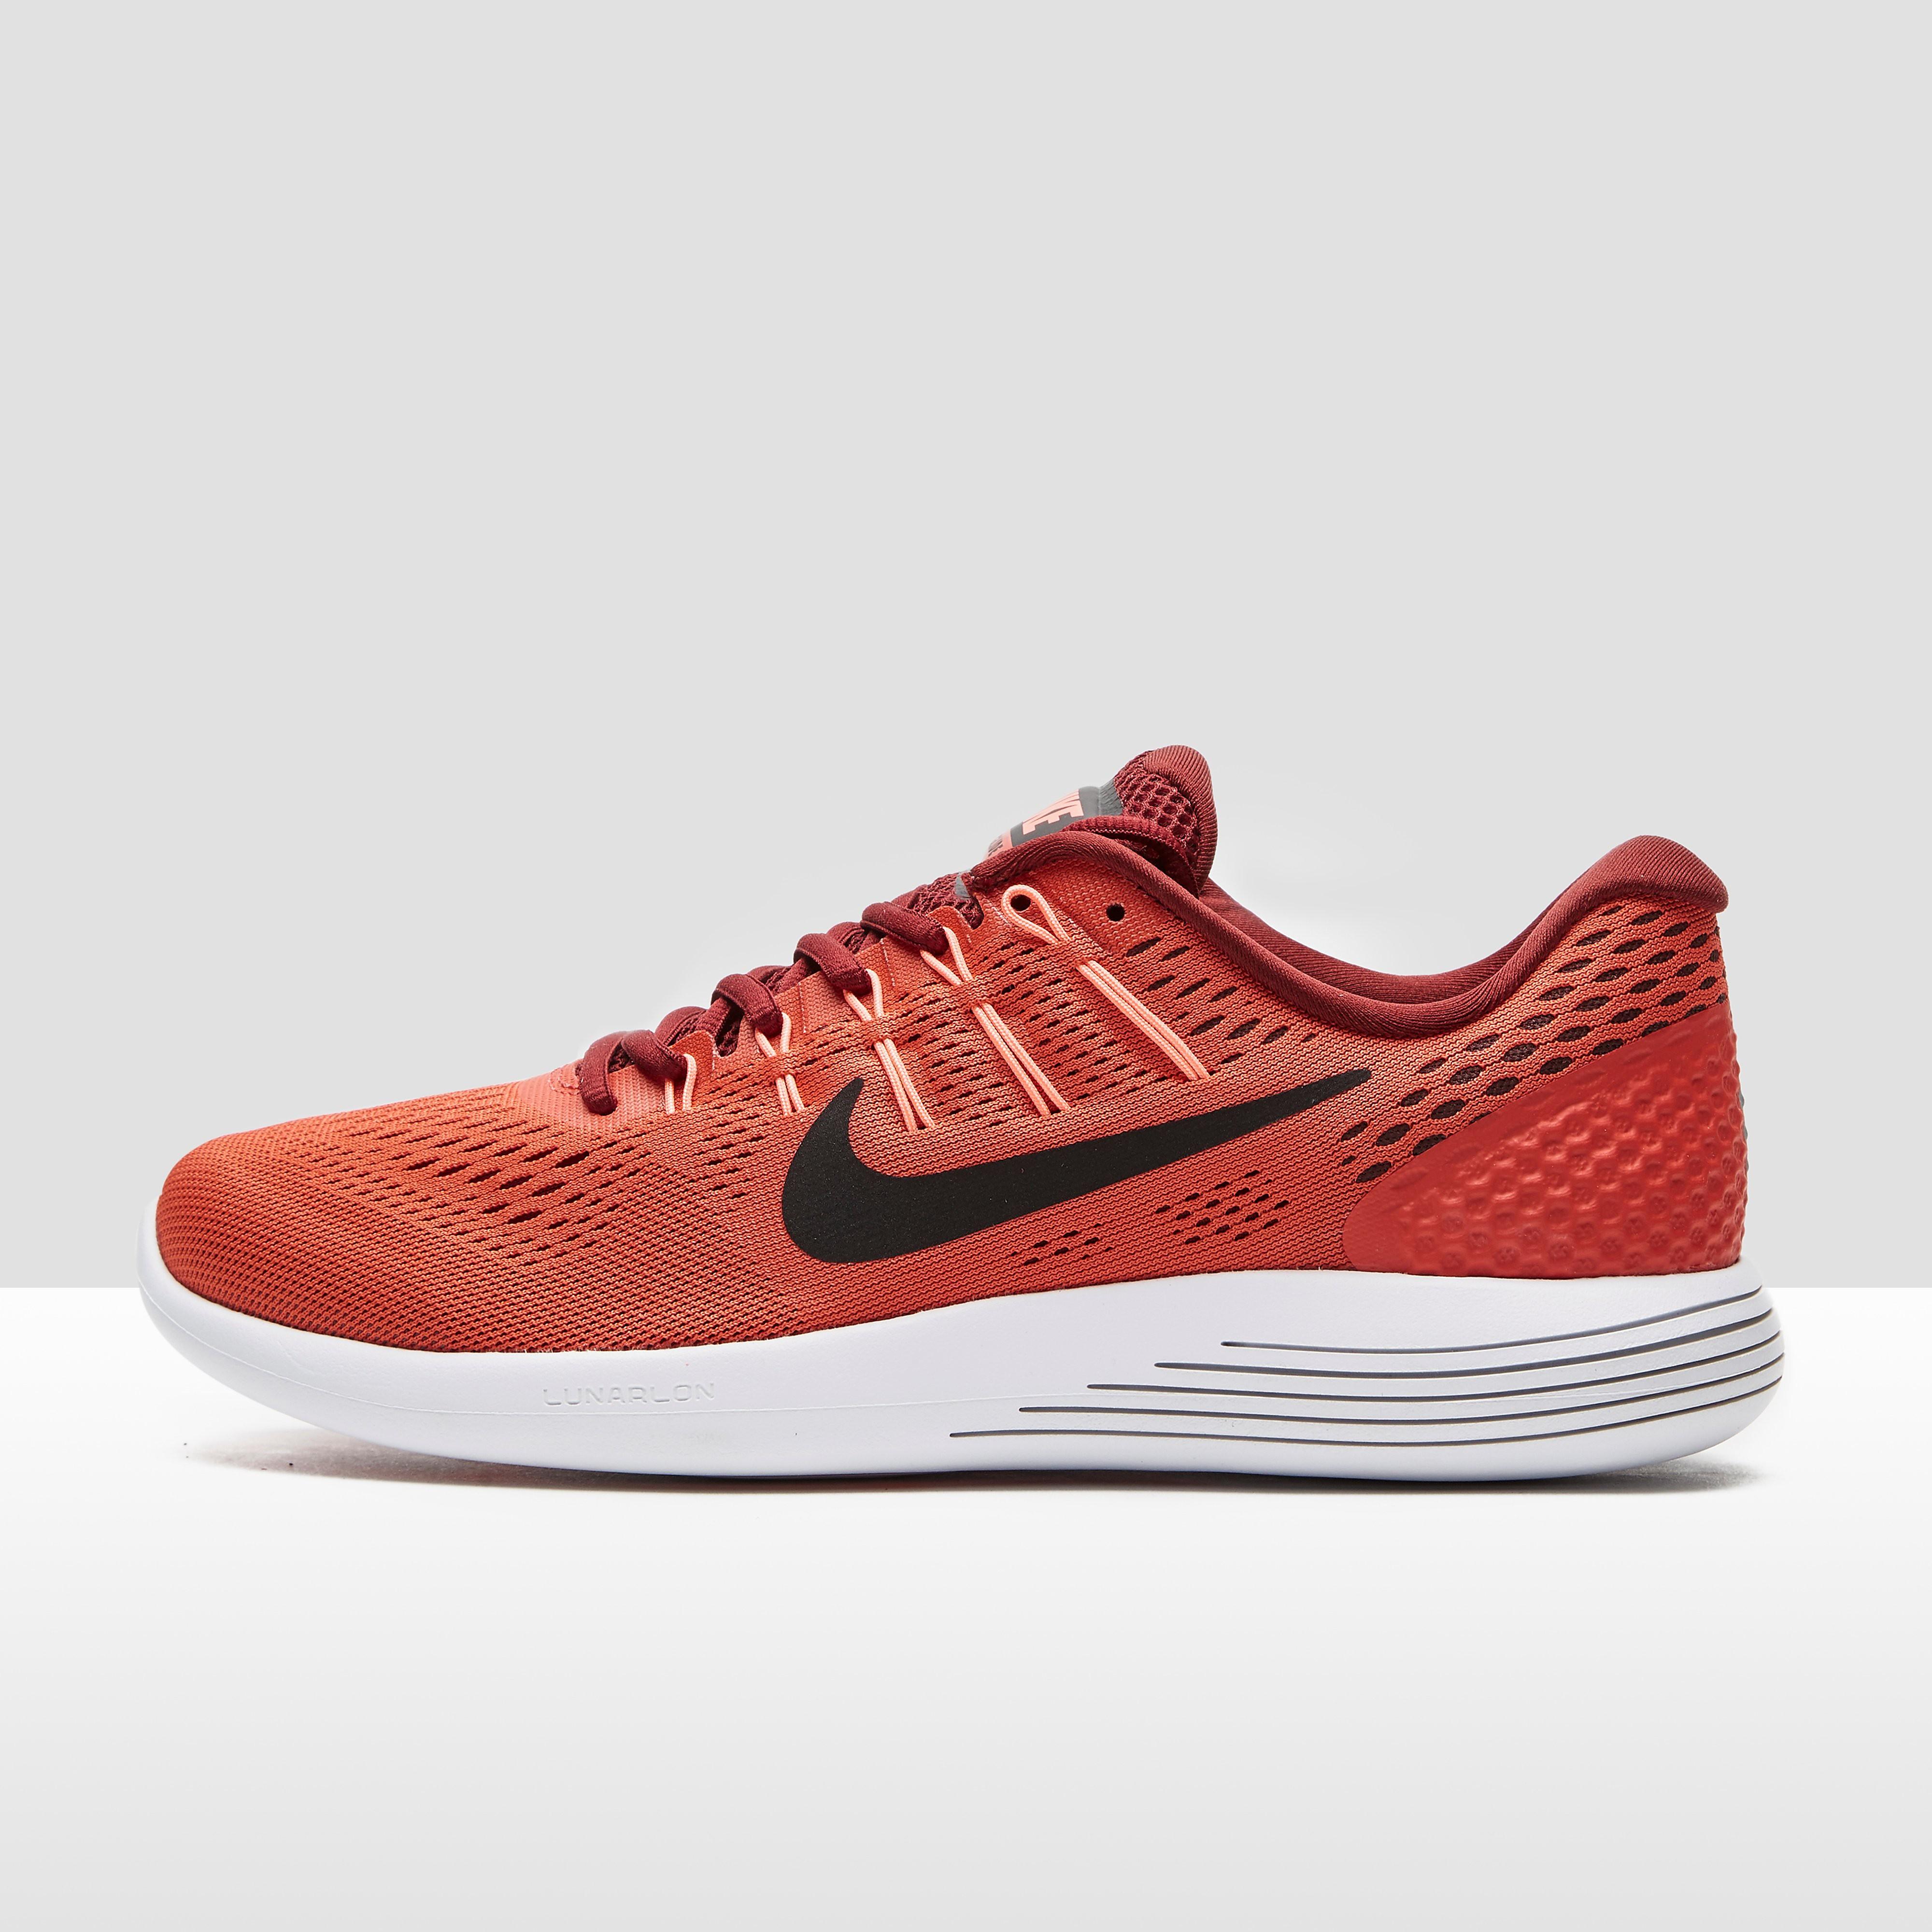 Nike LunarGlide 8 Men's Running Shoes